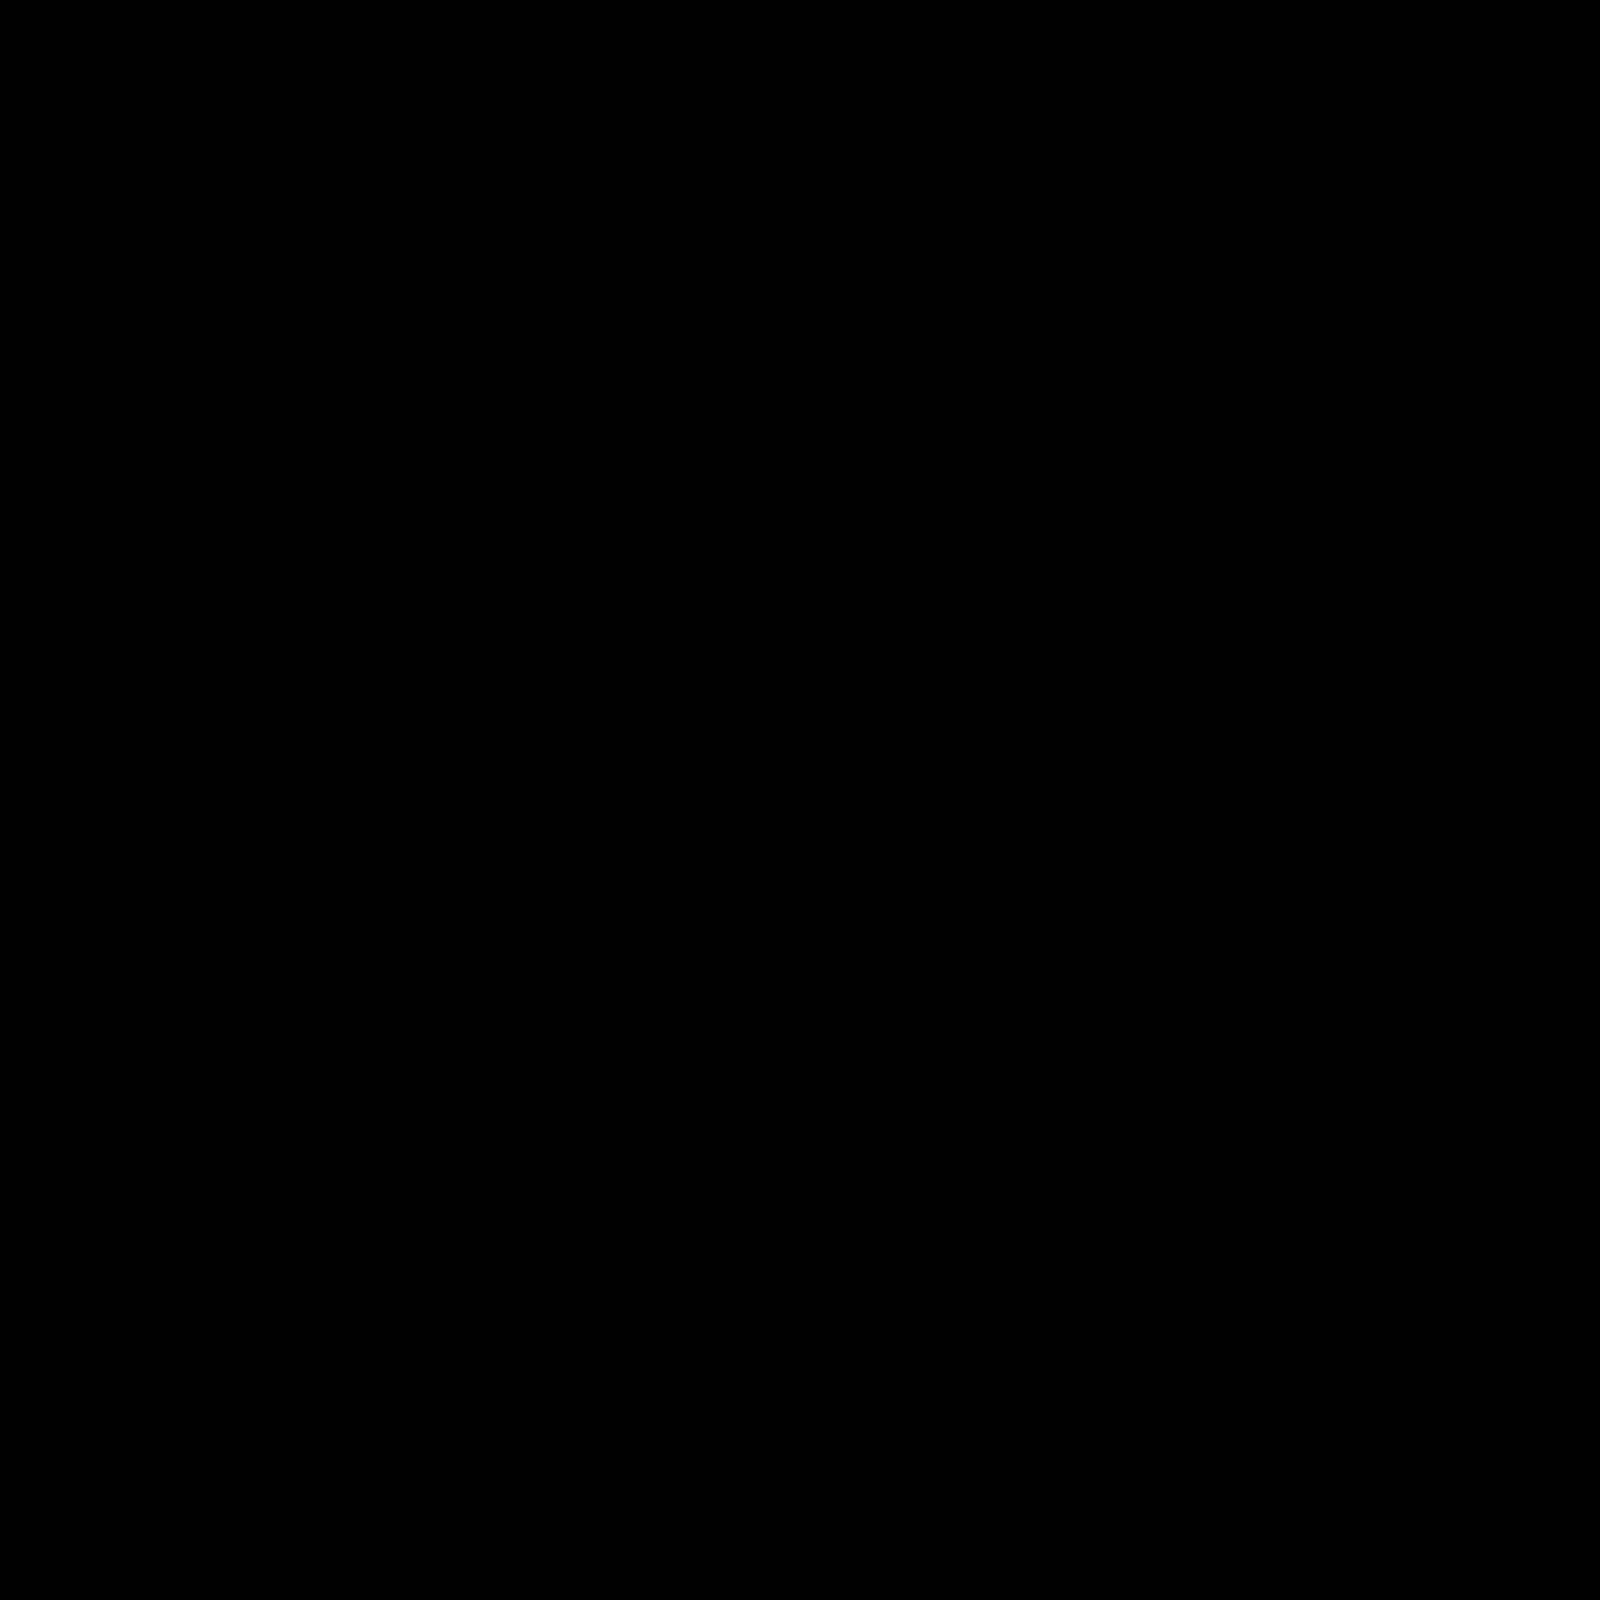 image library Hercule poirot icono descarga. Mustache clipart black and white